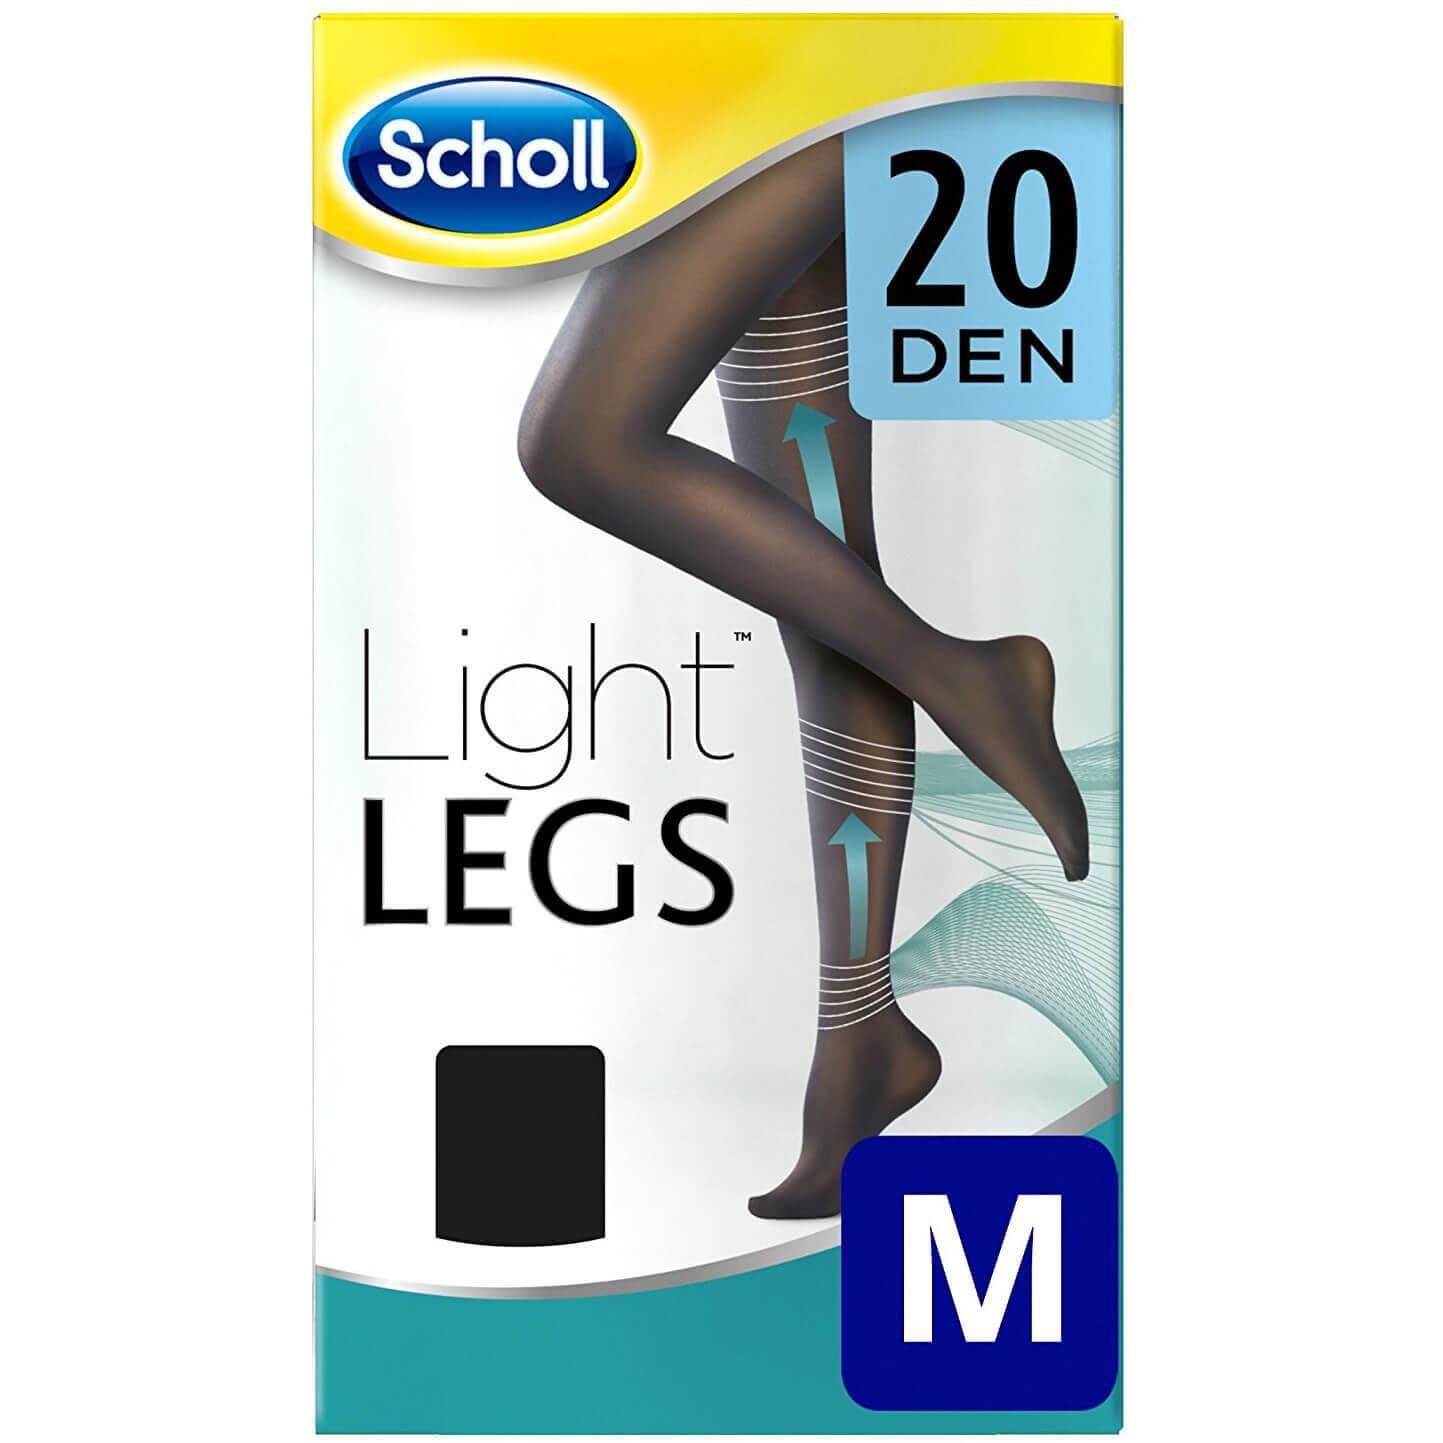 Dr Scholl Light Legs 20 DEN Noir Καλσόν Διαβαθμισμένης Συμπίεσης με Τεχνολογία Fibre Firm σε Μαύρο Χρώμα – M